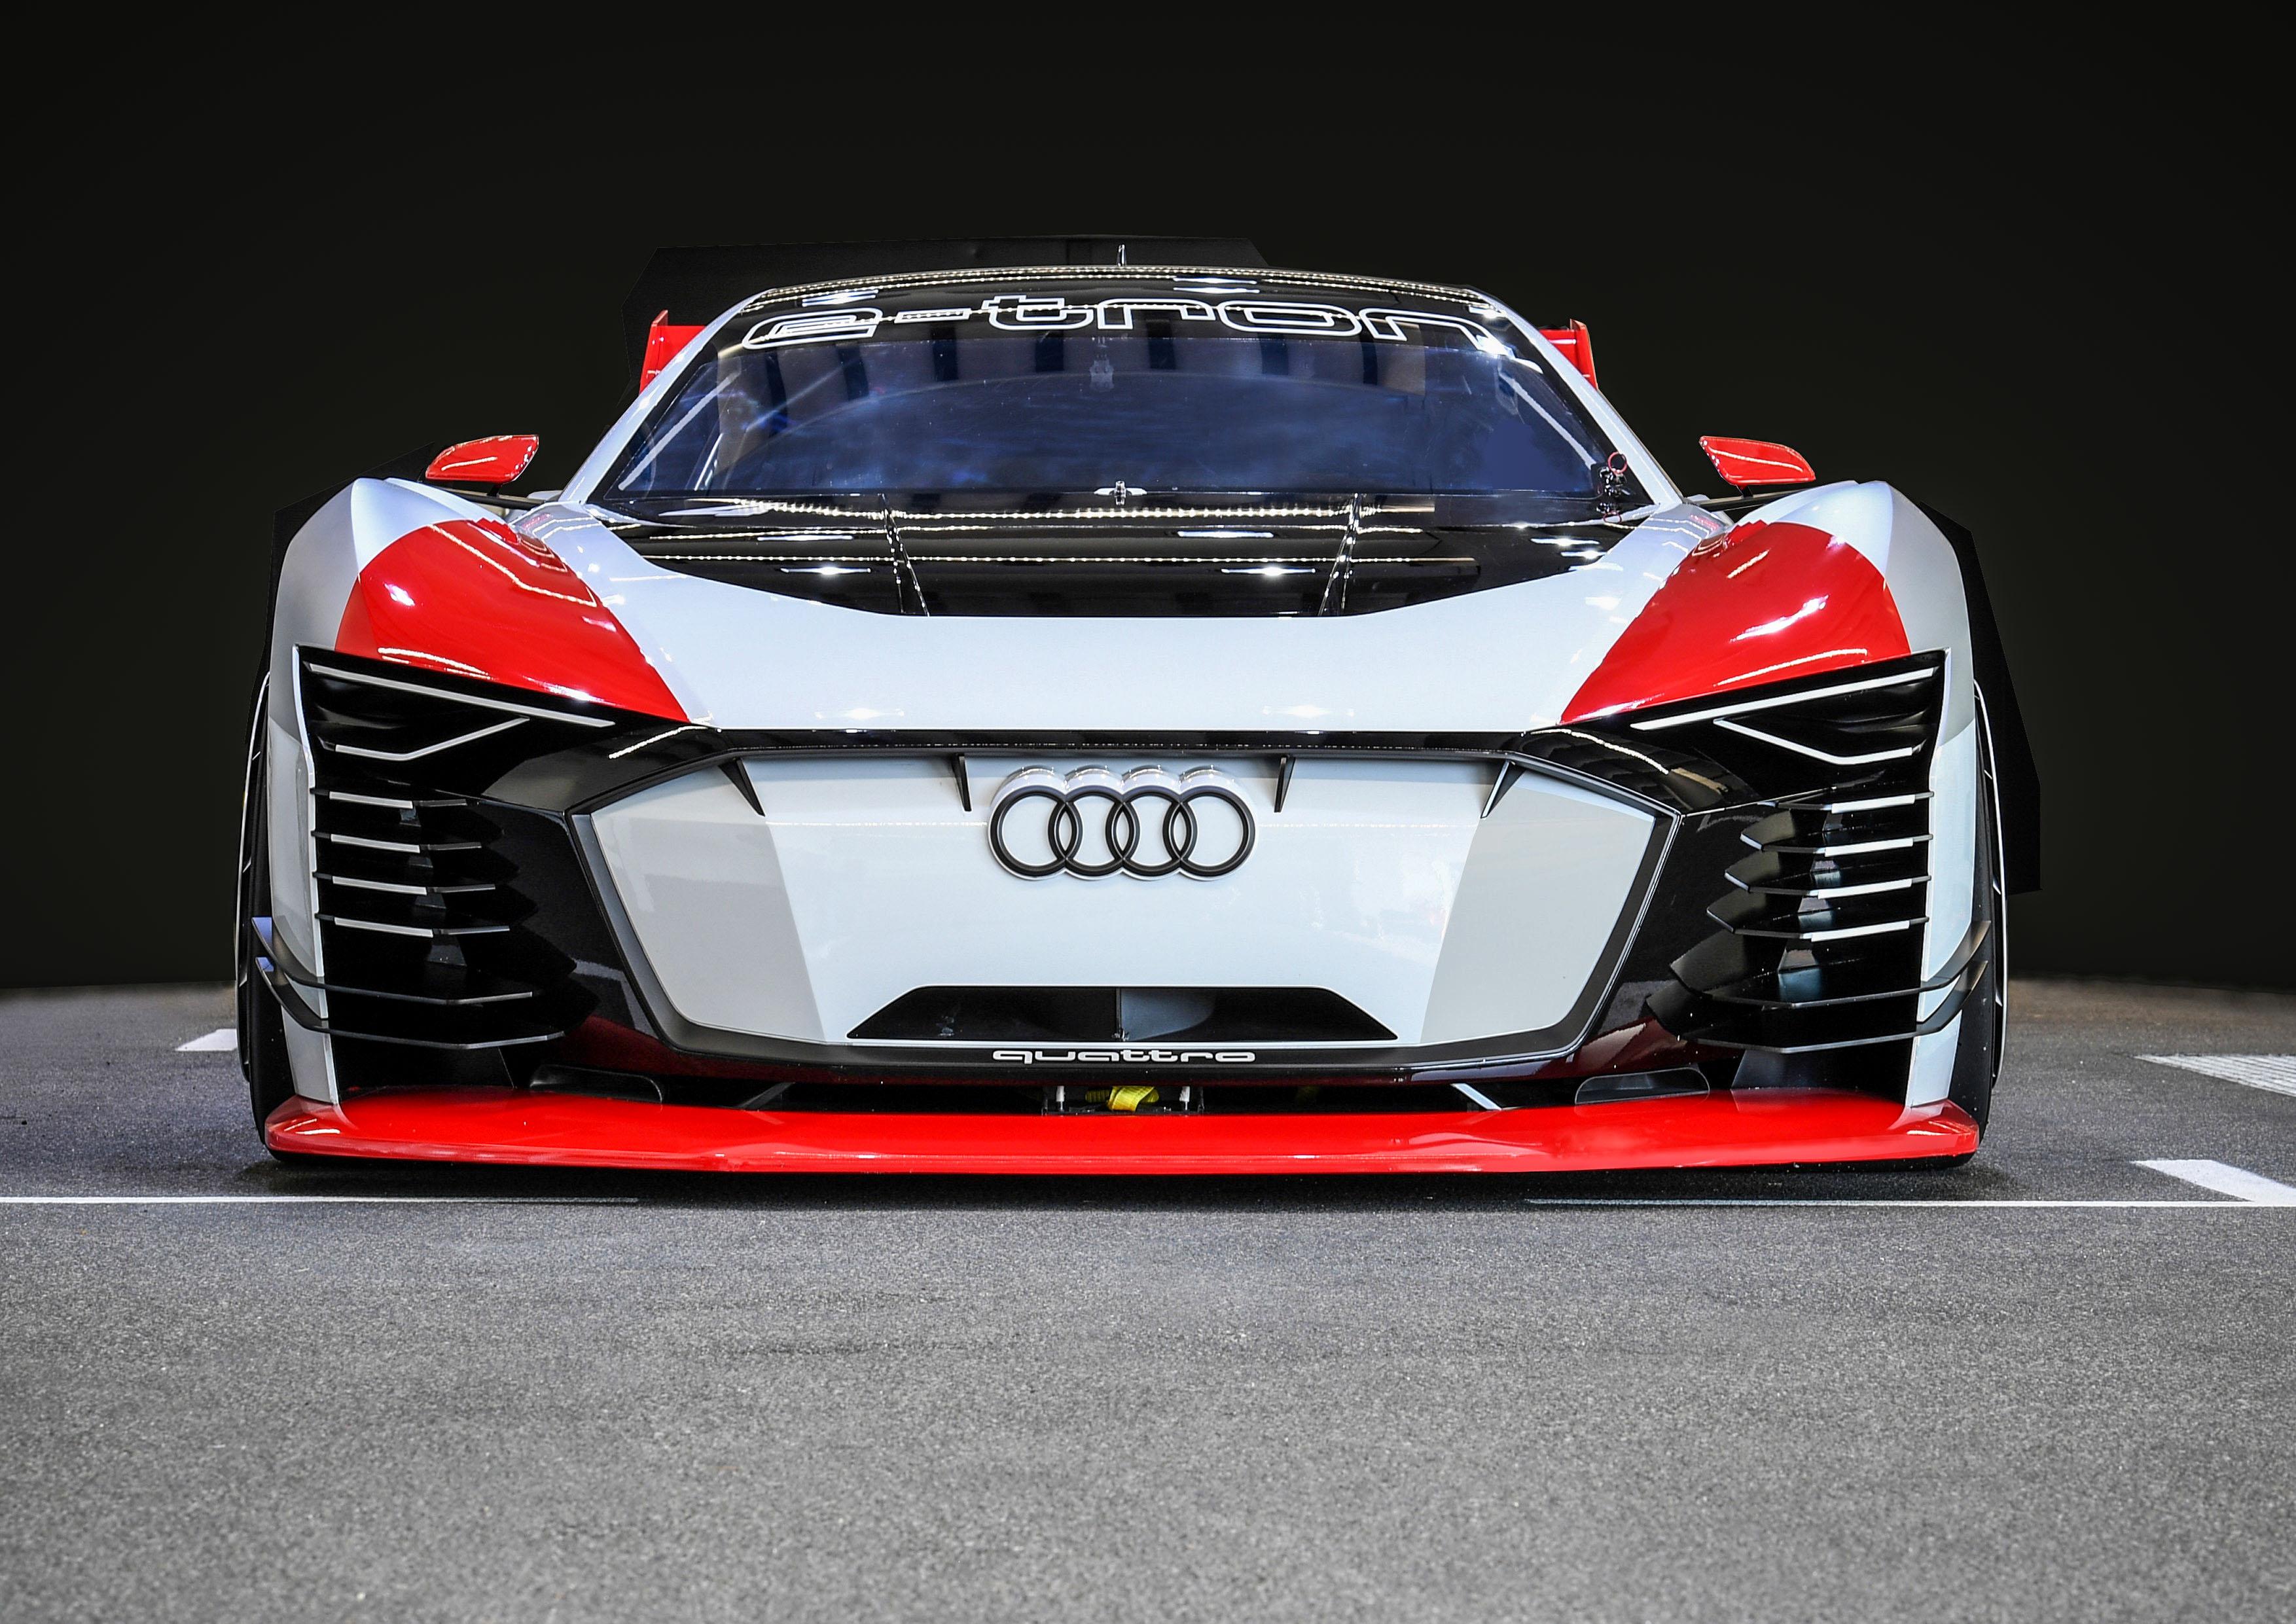 Mi-virtuel, mi-réel, le concept Audi e-Tron Vision Gran Turismo